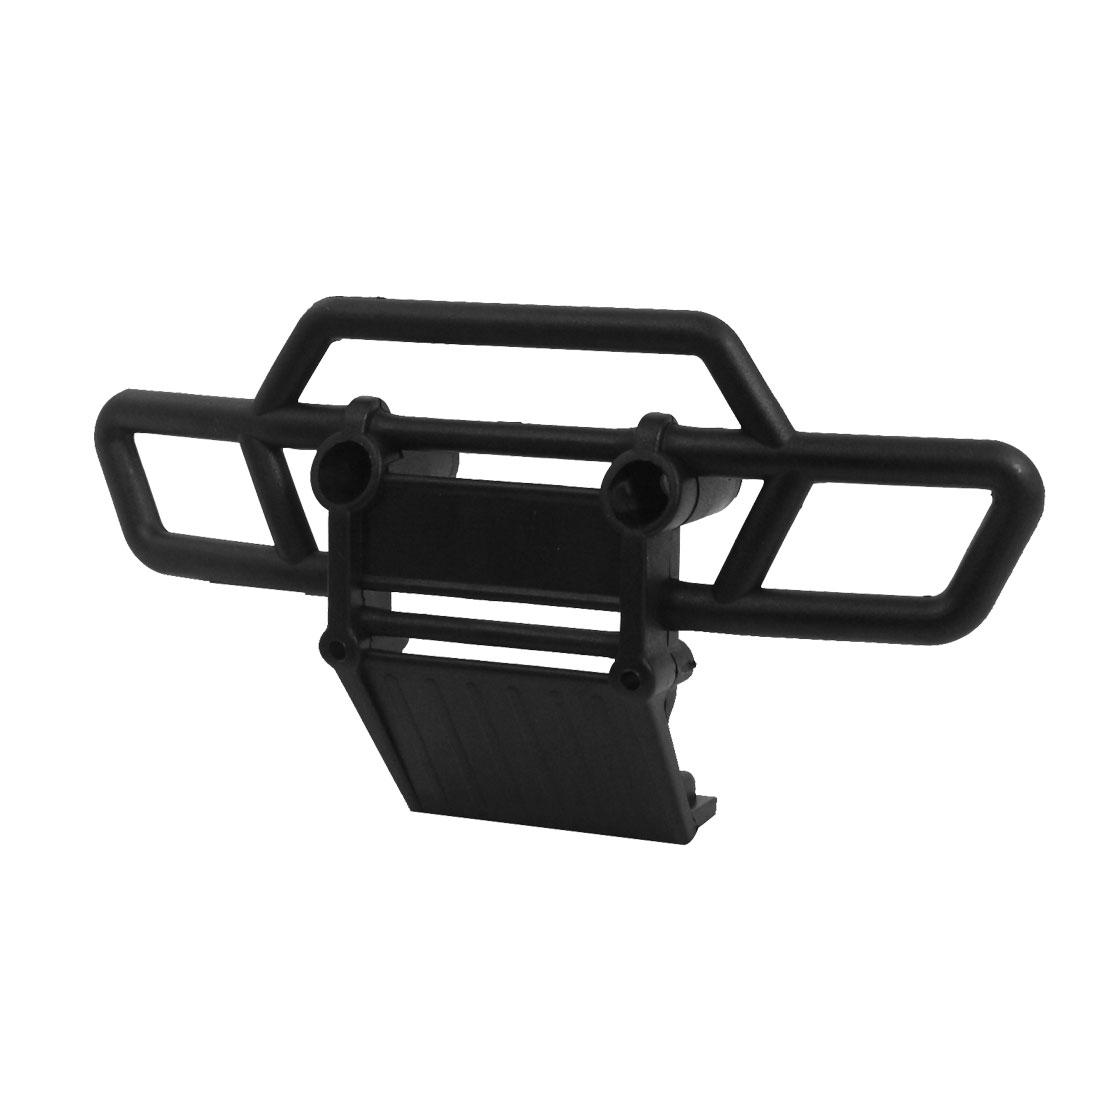 08002 Plastic Front Bumper for RC 1/10 4WD Car Model 94188/94111